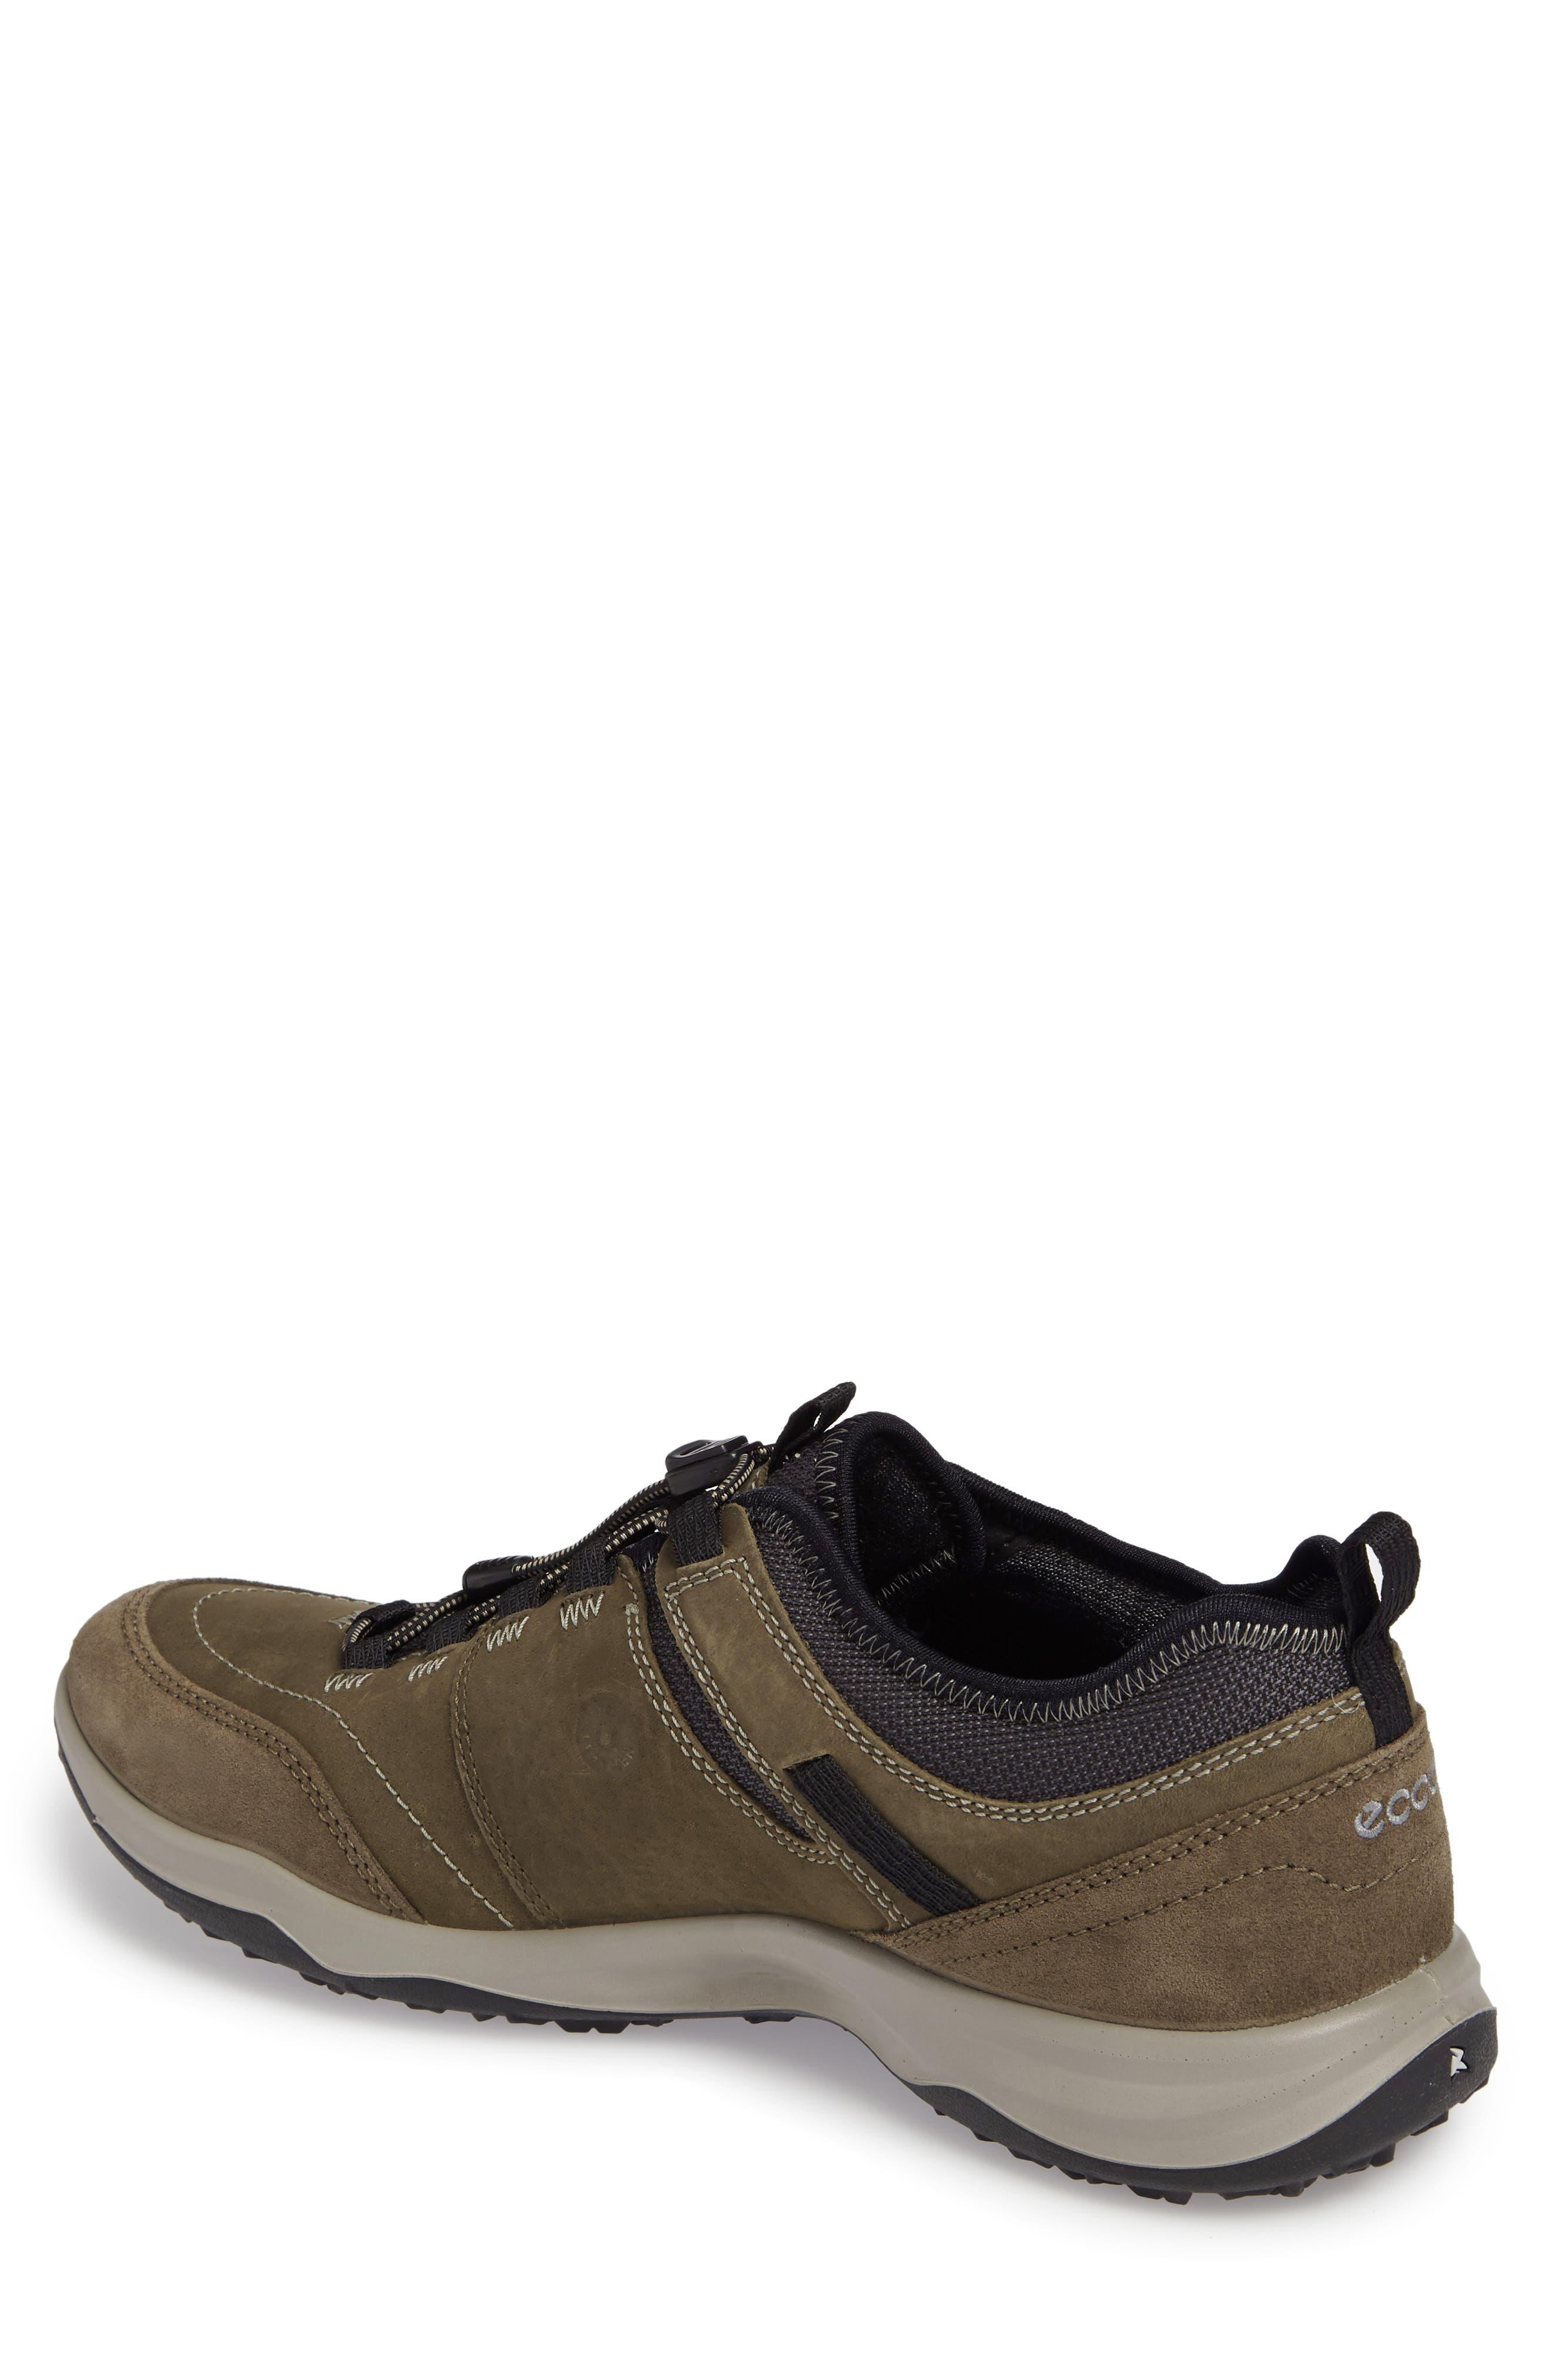 Alternate Image 2  - ECCO 'Espinho GTX' Sneaker (Men)